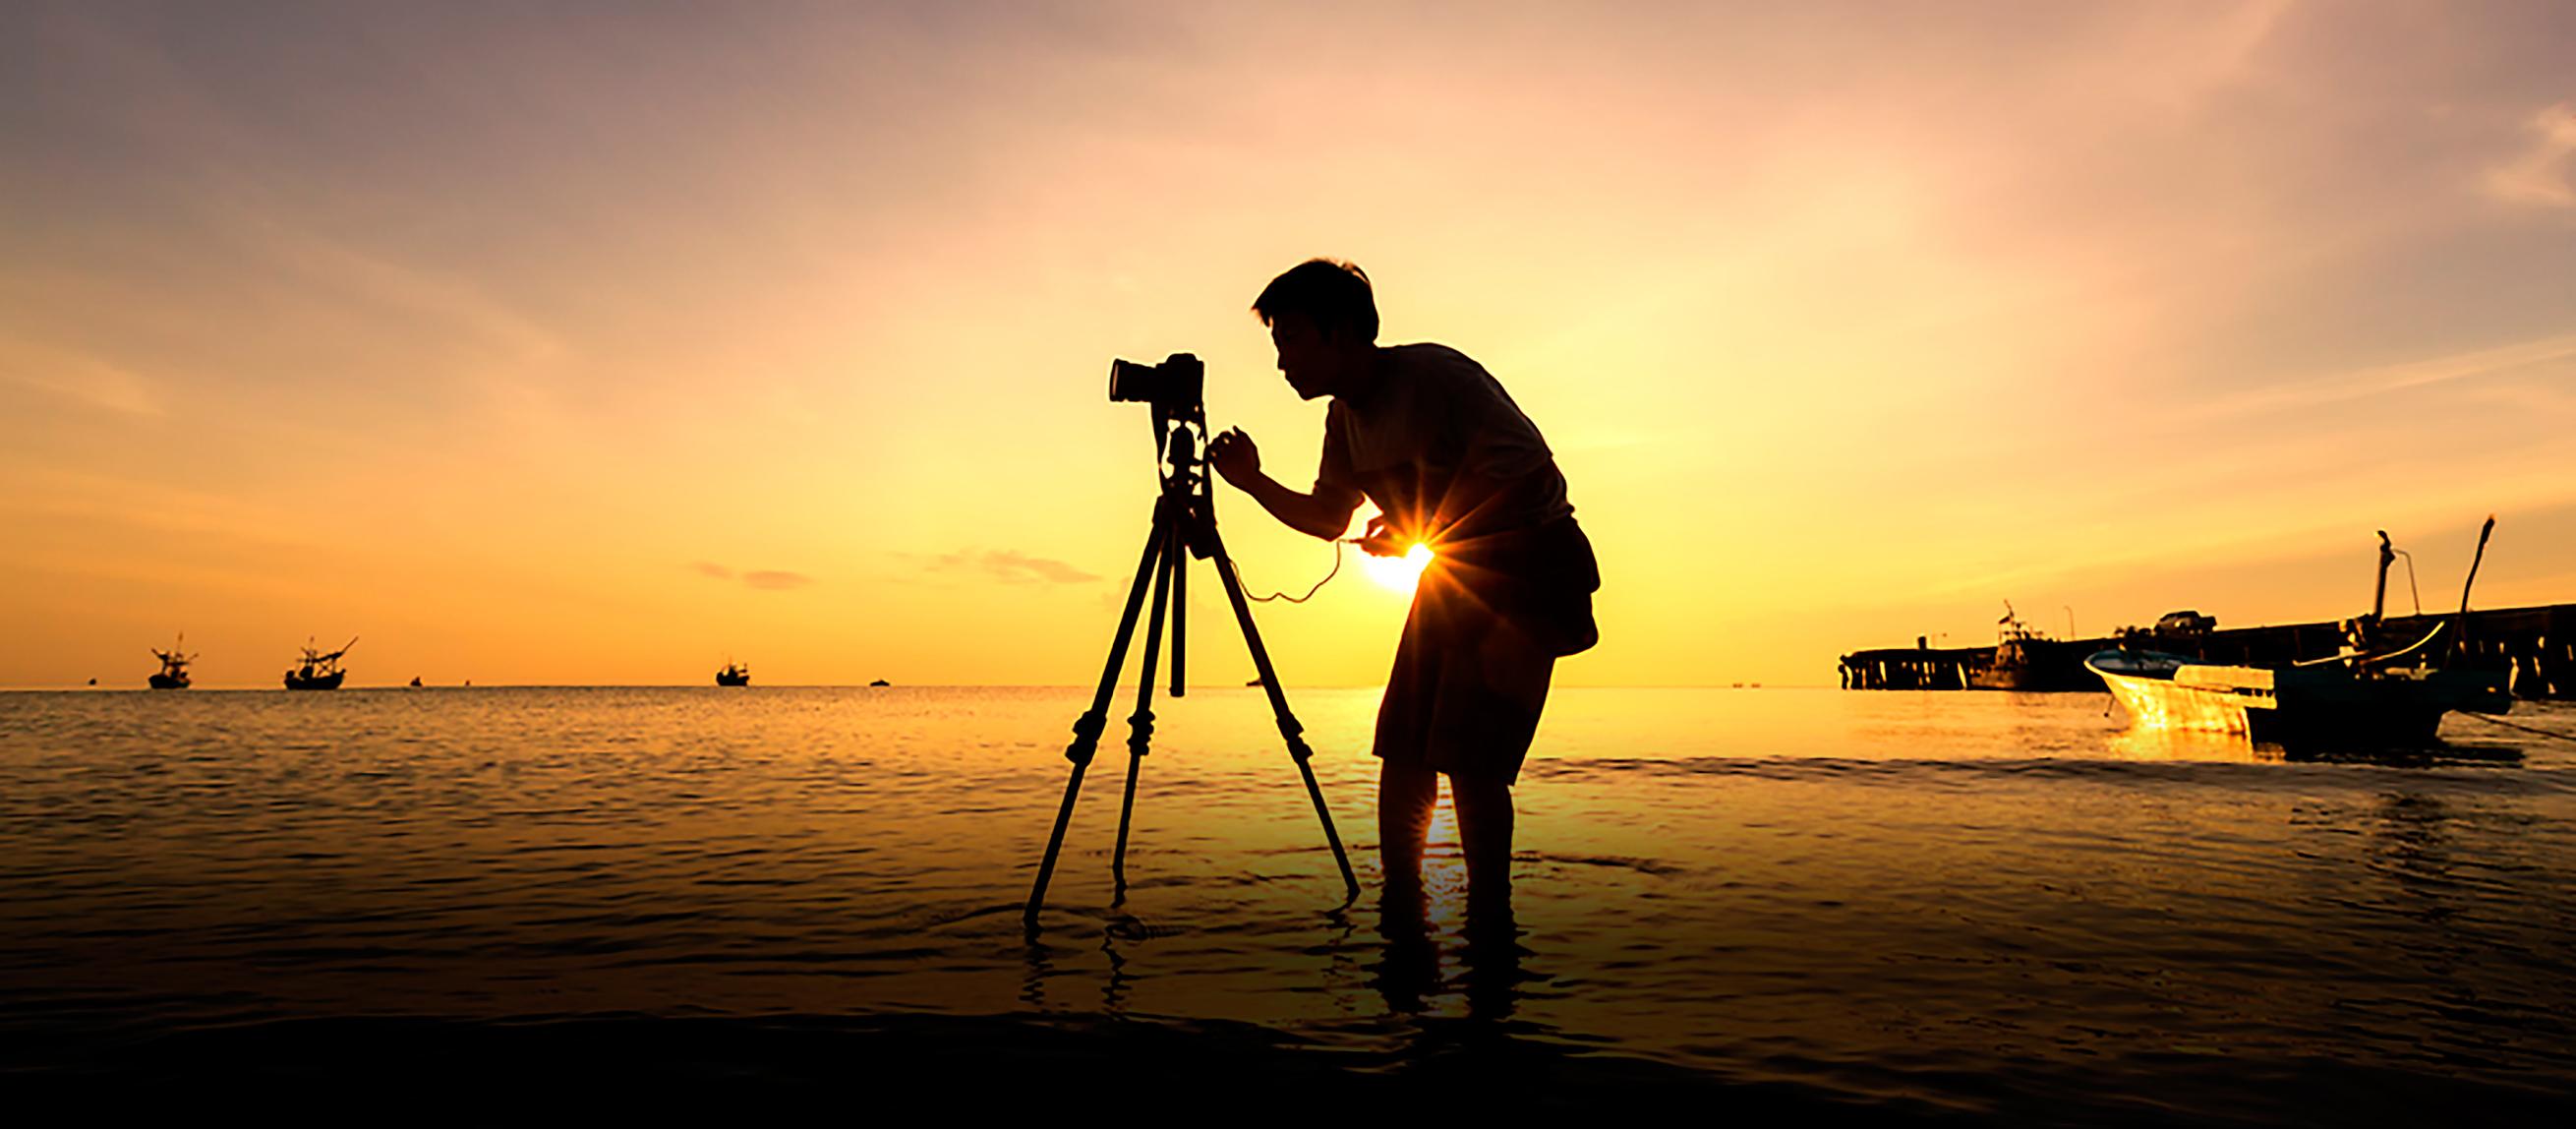 📷 Fotografie als Beruf ⚓️ 3 häufige Irrtümer - Benjamin